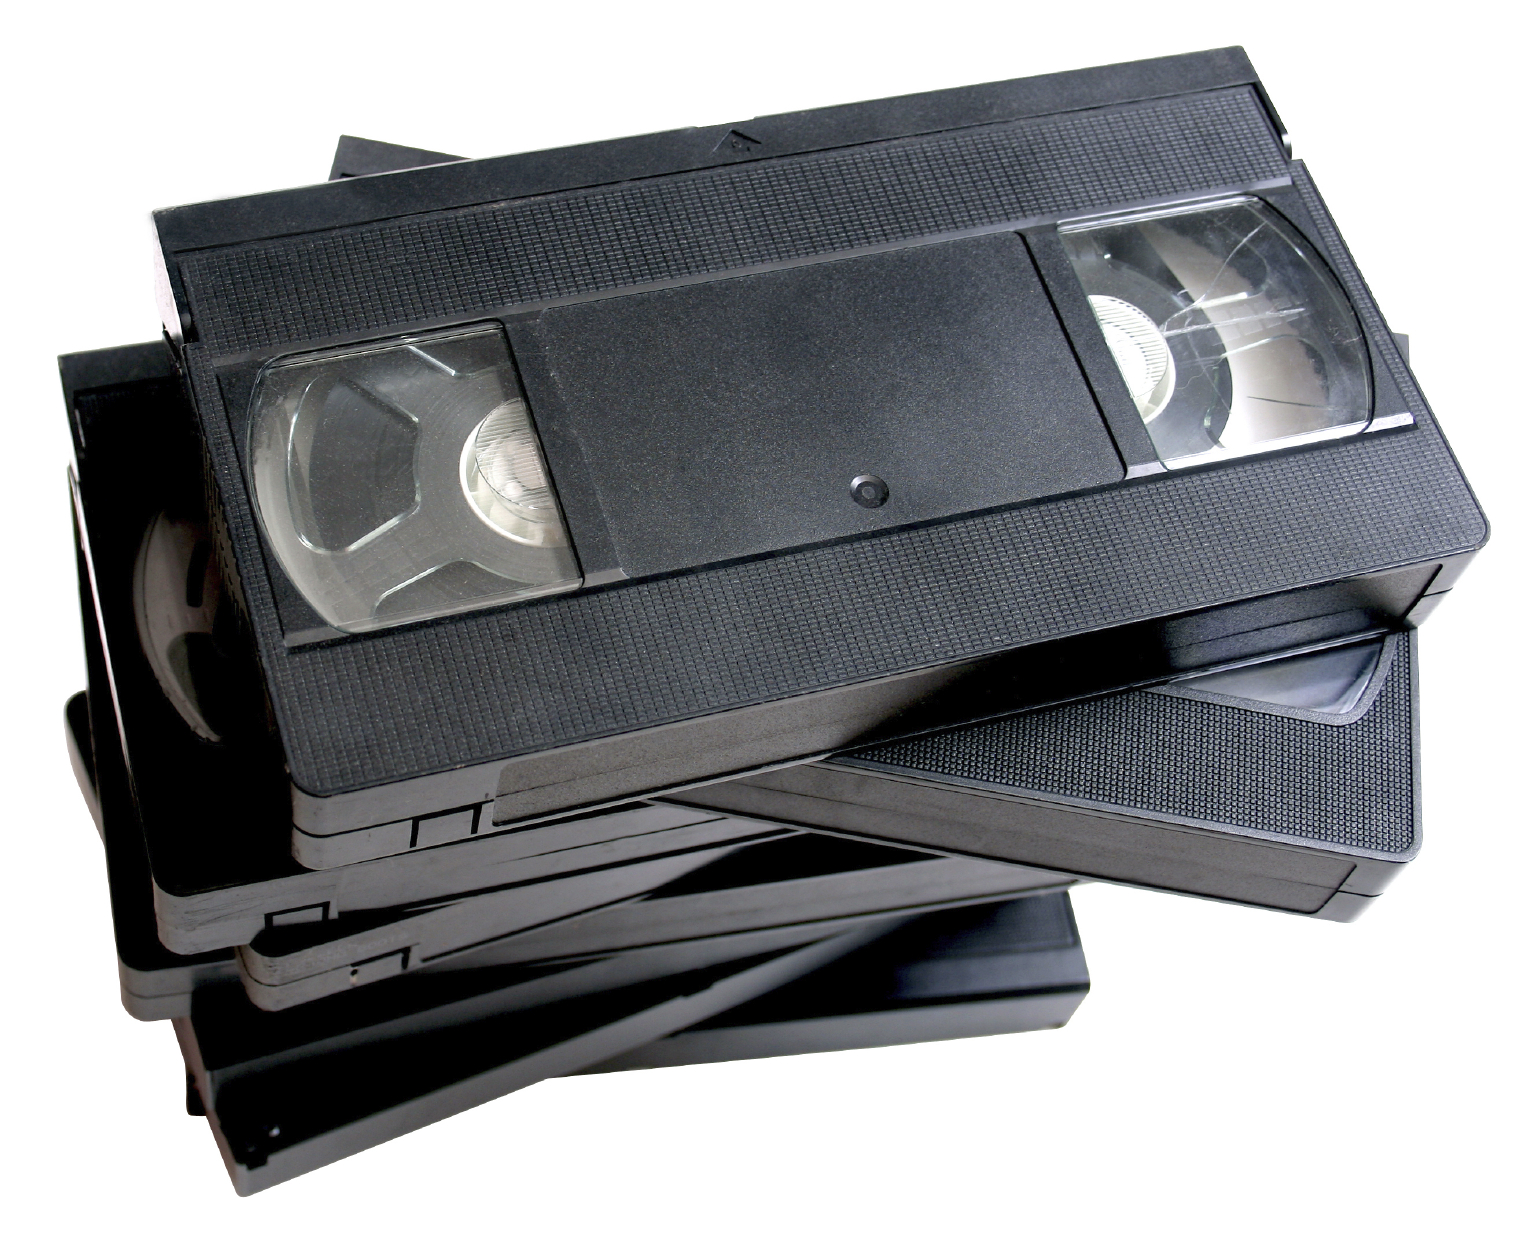 Photo of Sfarsitul unei ere. Ultimul player VHS va fi produs saptamana viitoare.